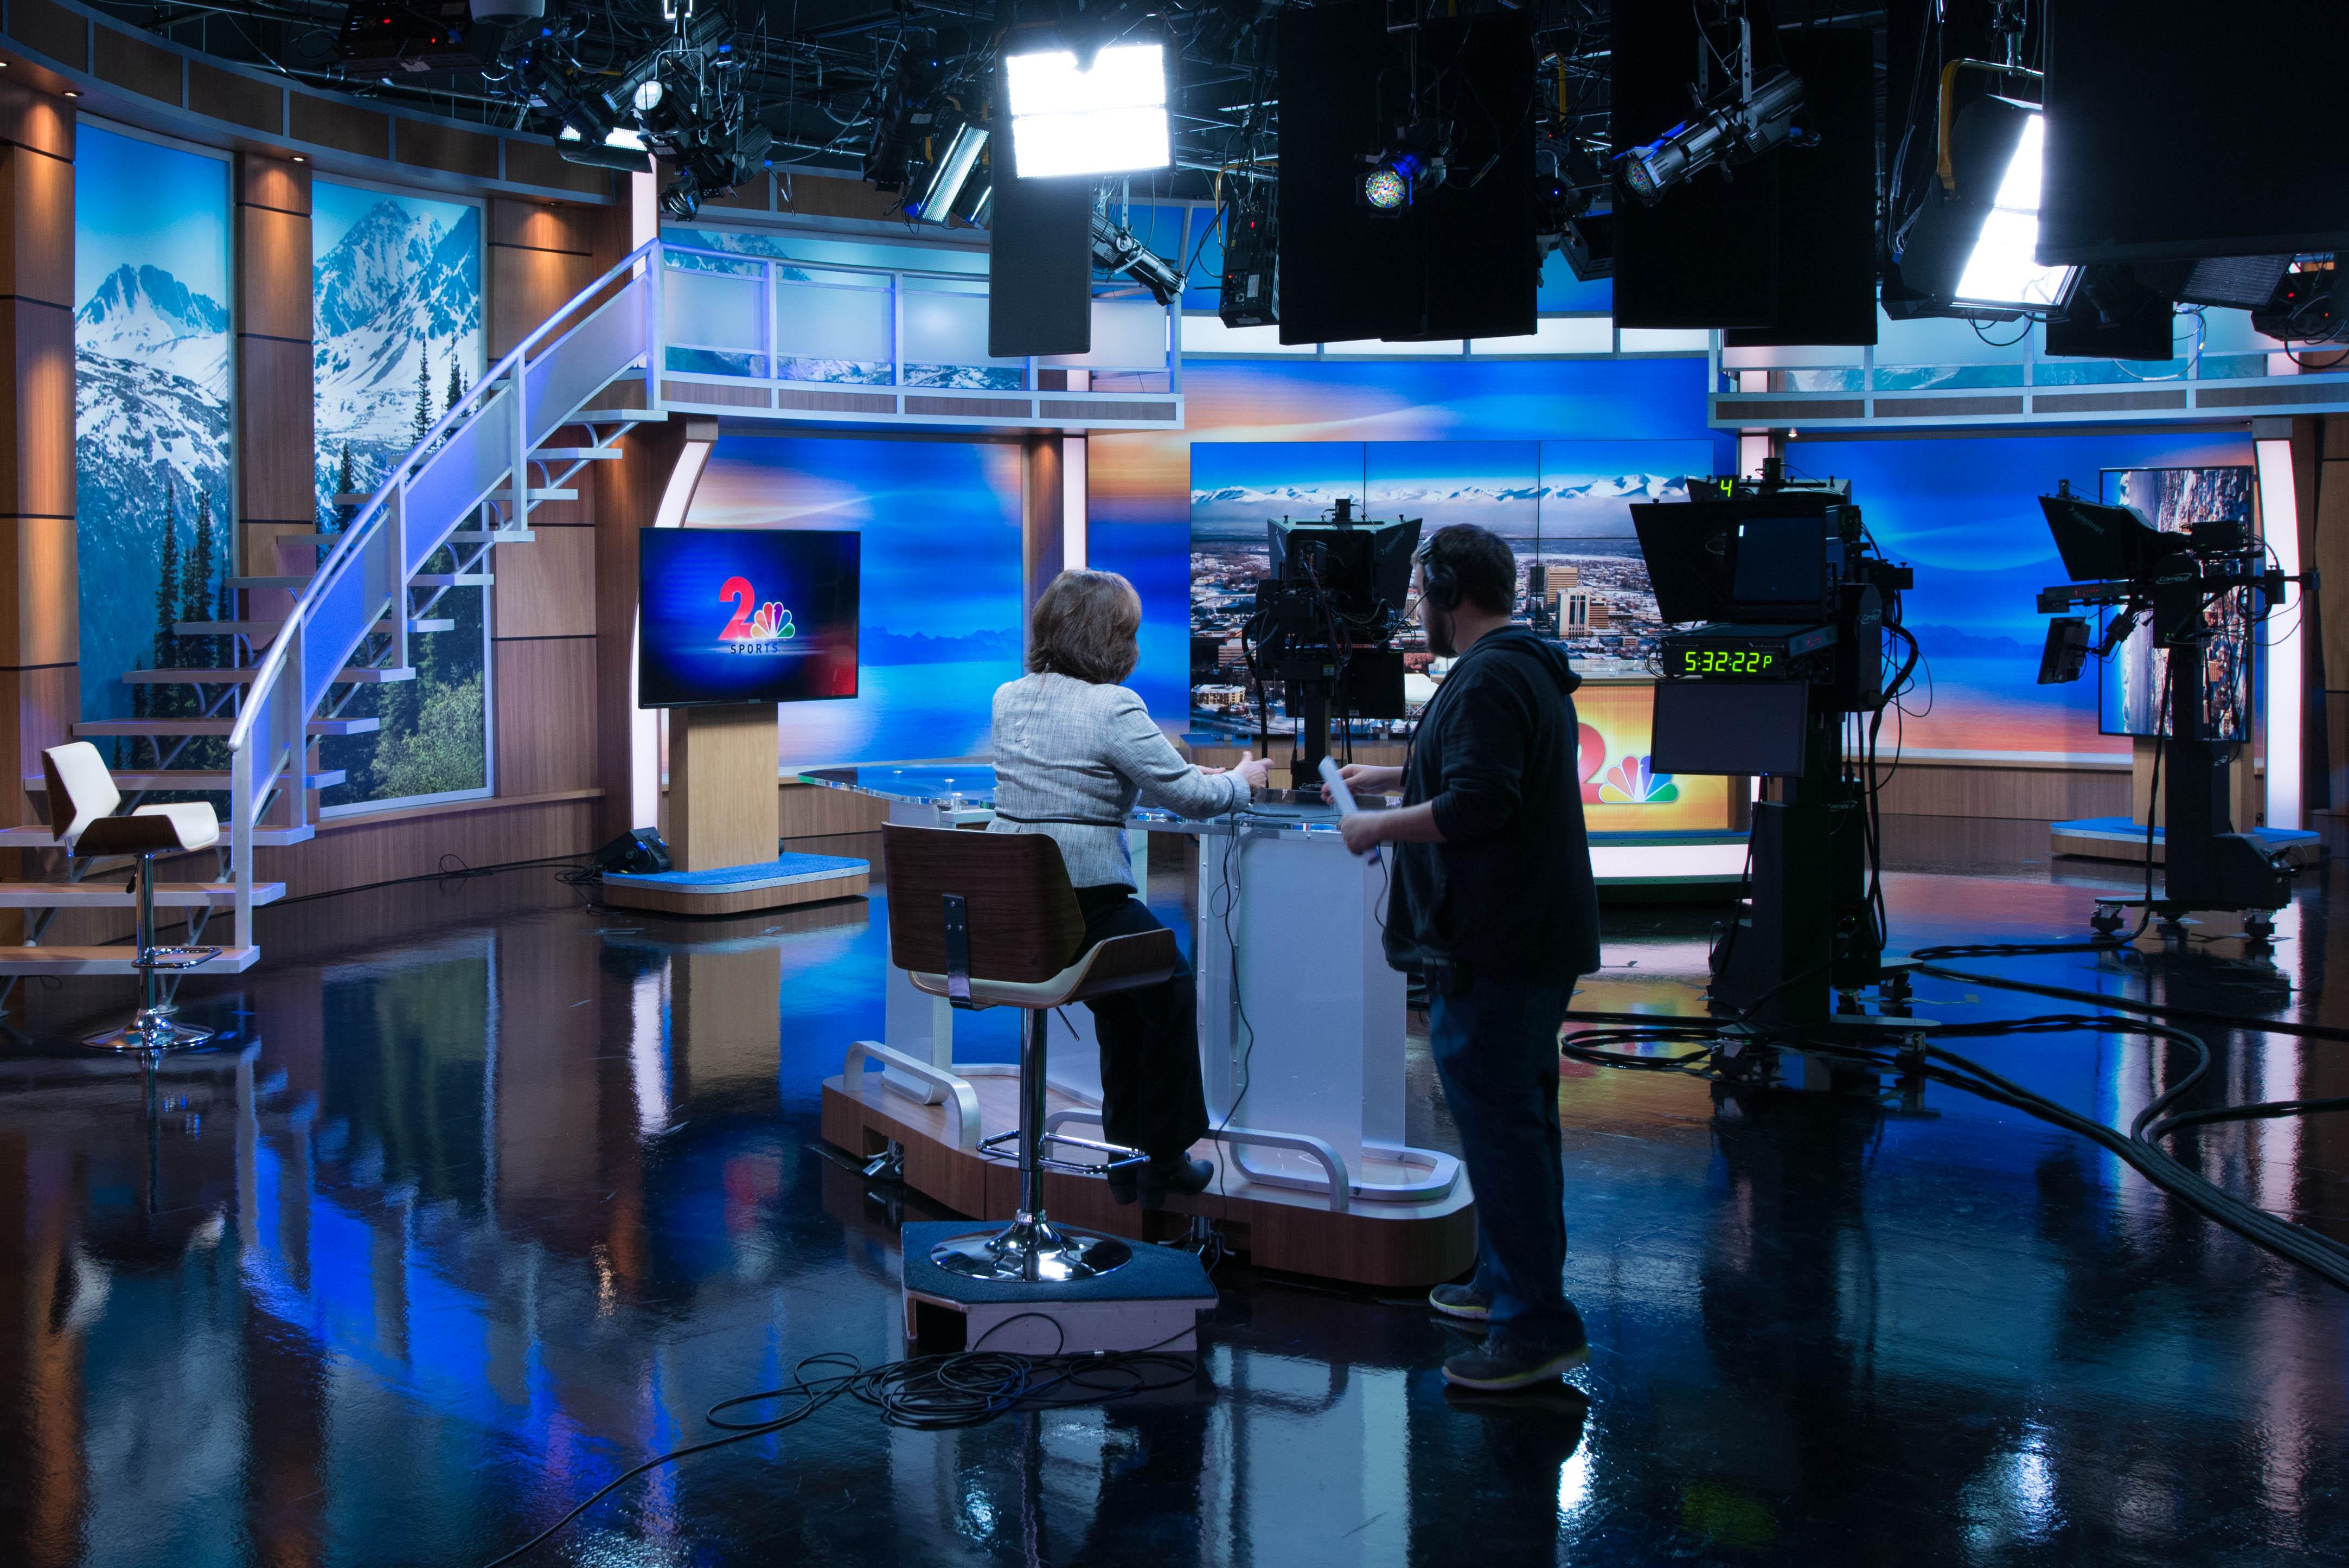 Becktv Completes Integration Of Forward Looking Broadcast